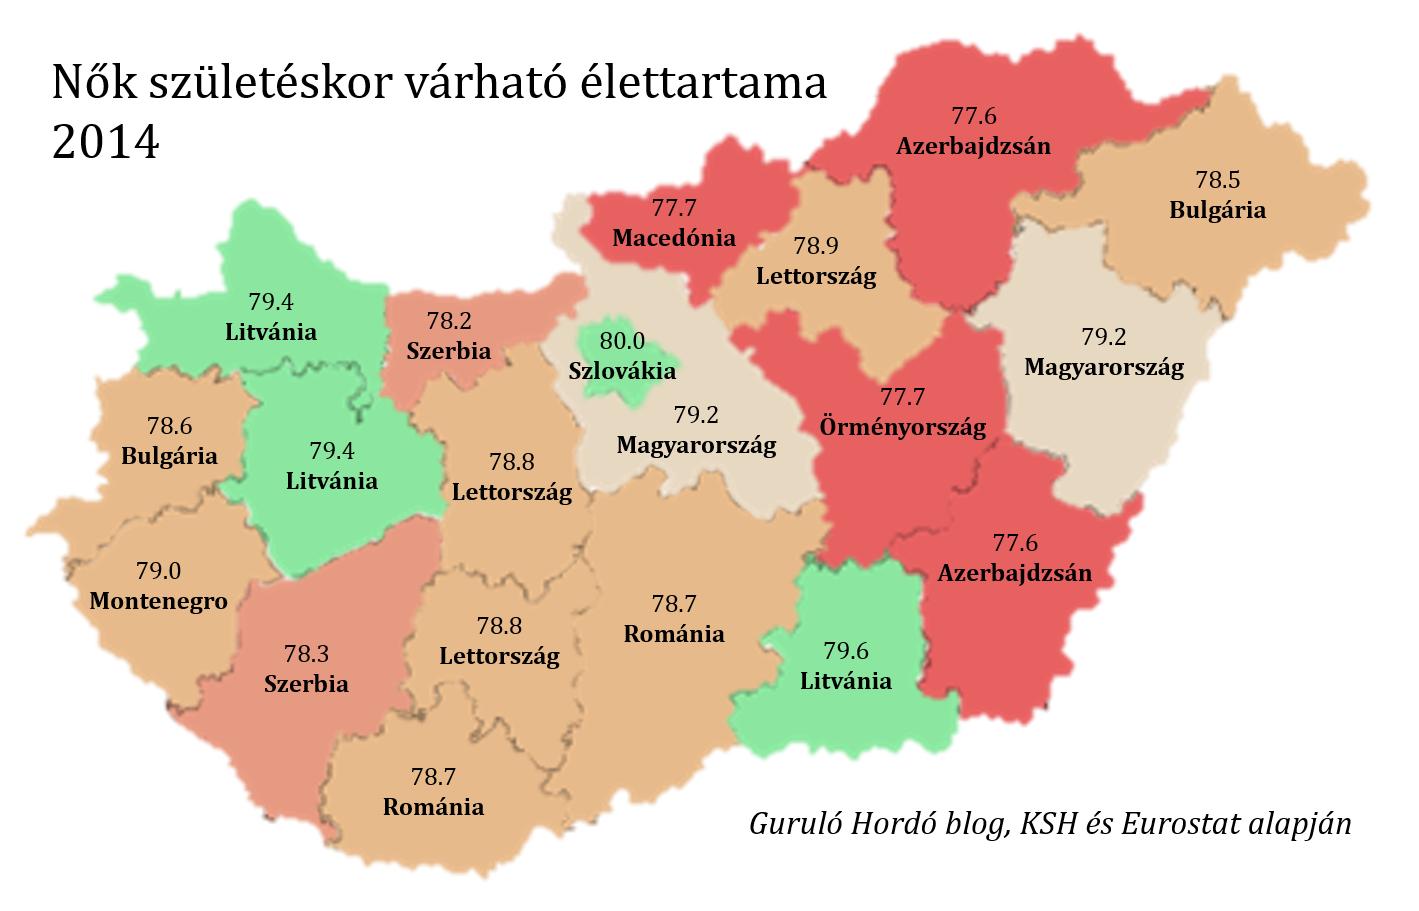 nok_szuleteskor_varhato_elettartama.png